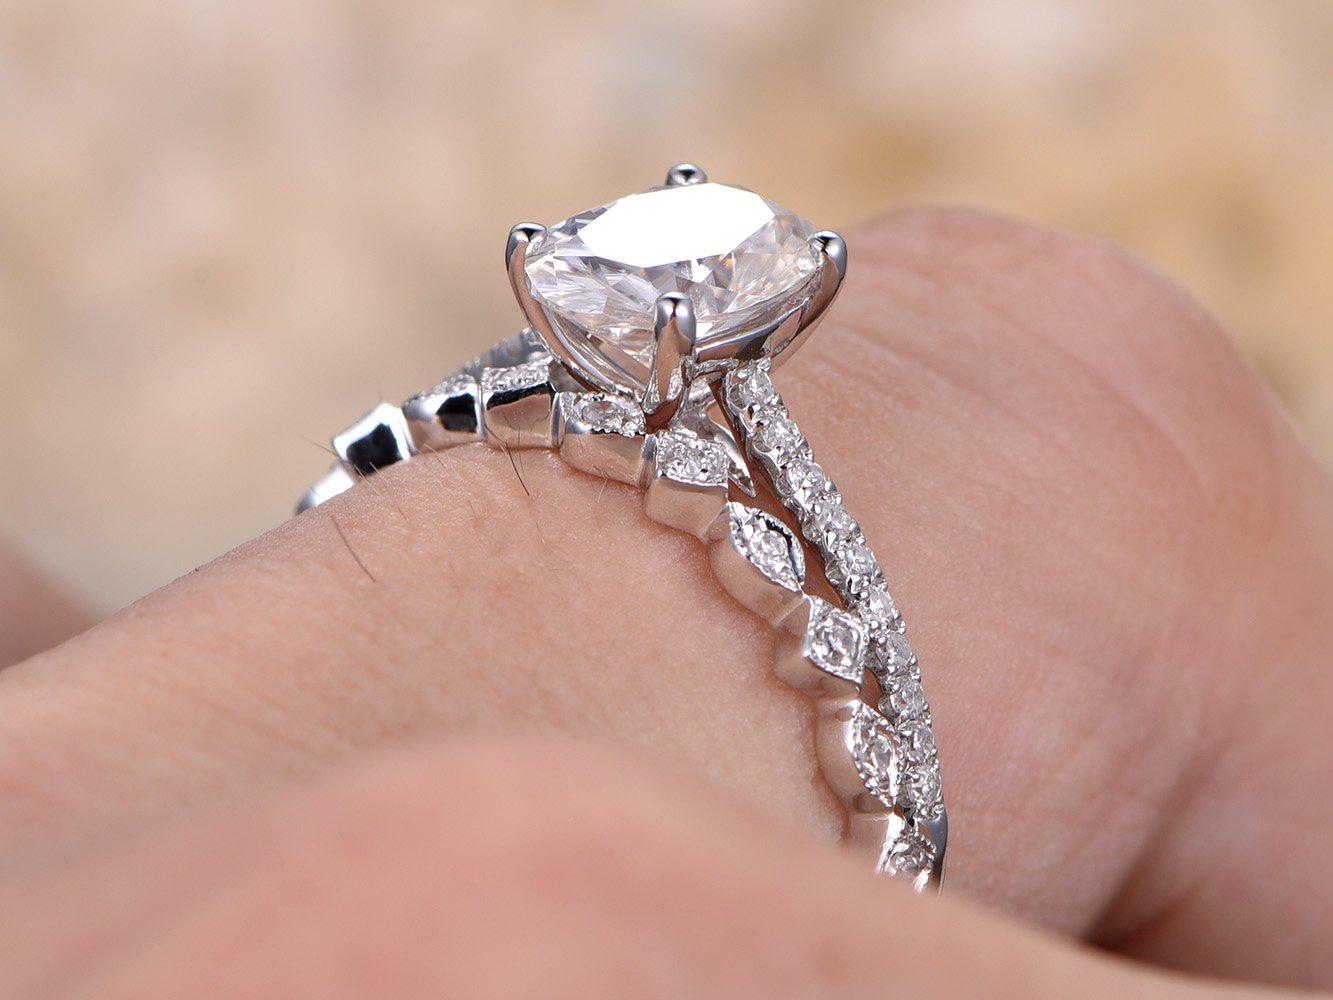 Amazon.com: Moissanite Wedding Ring Set,6x8mm Oval Cut Moissanite ...